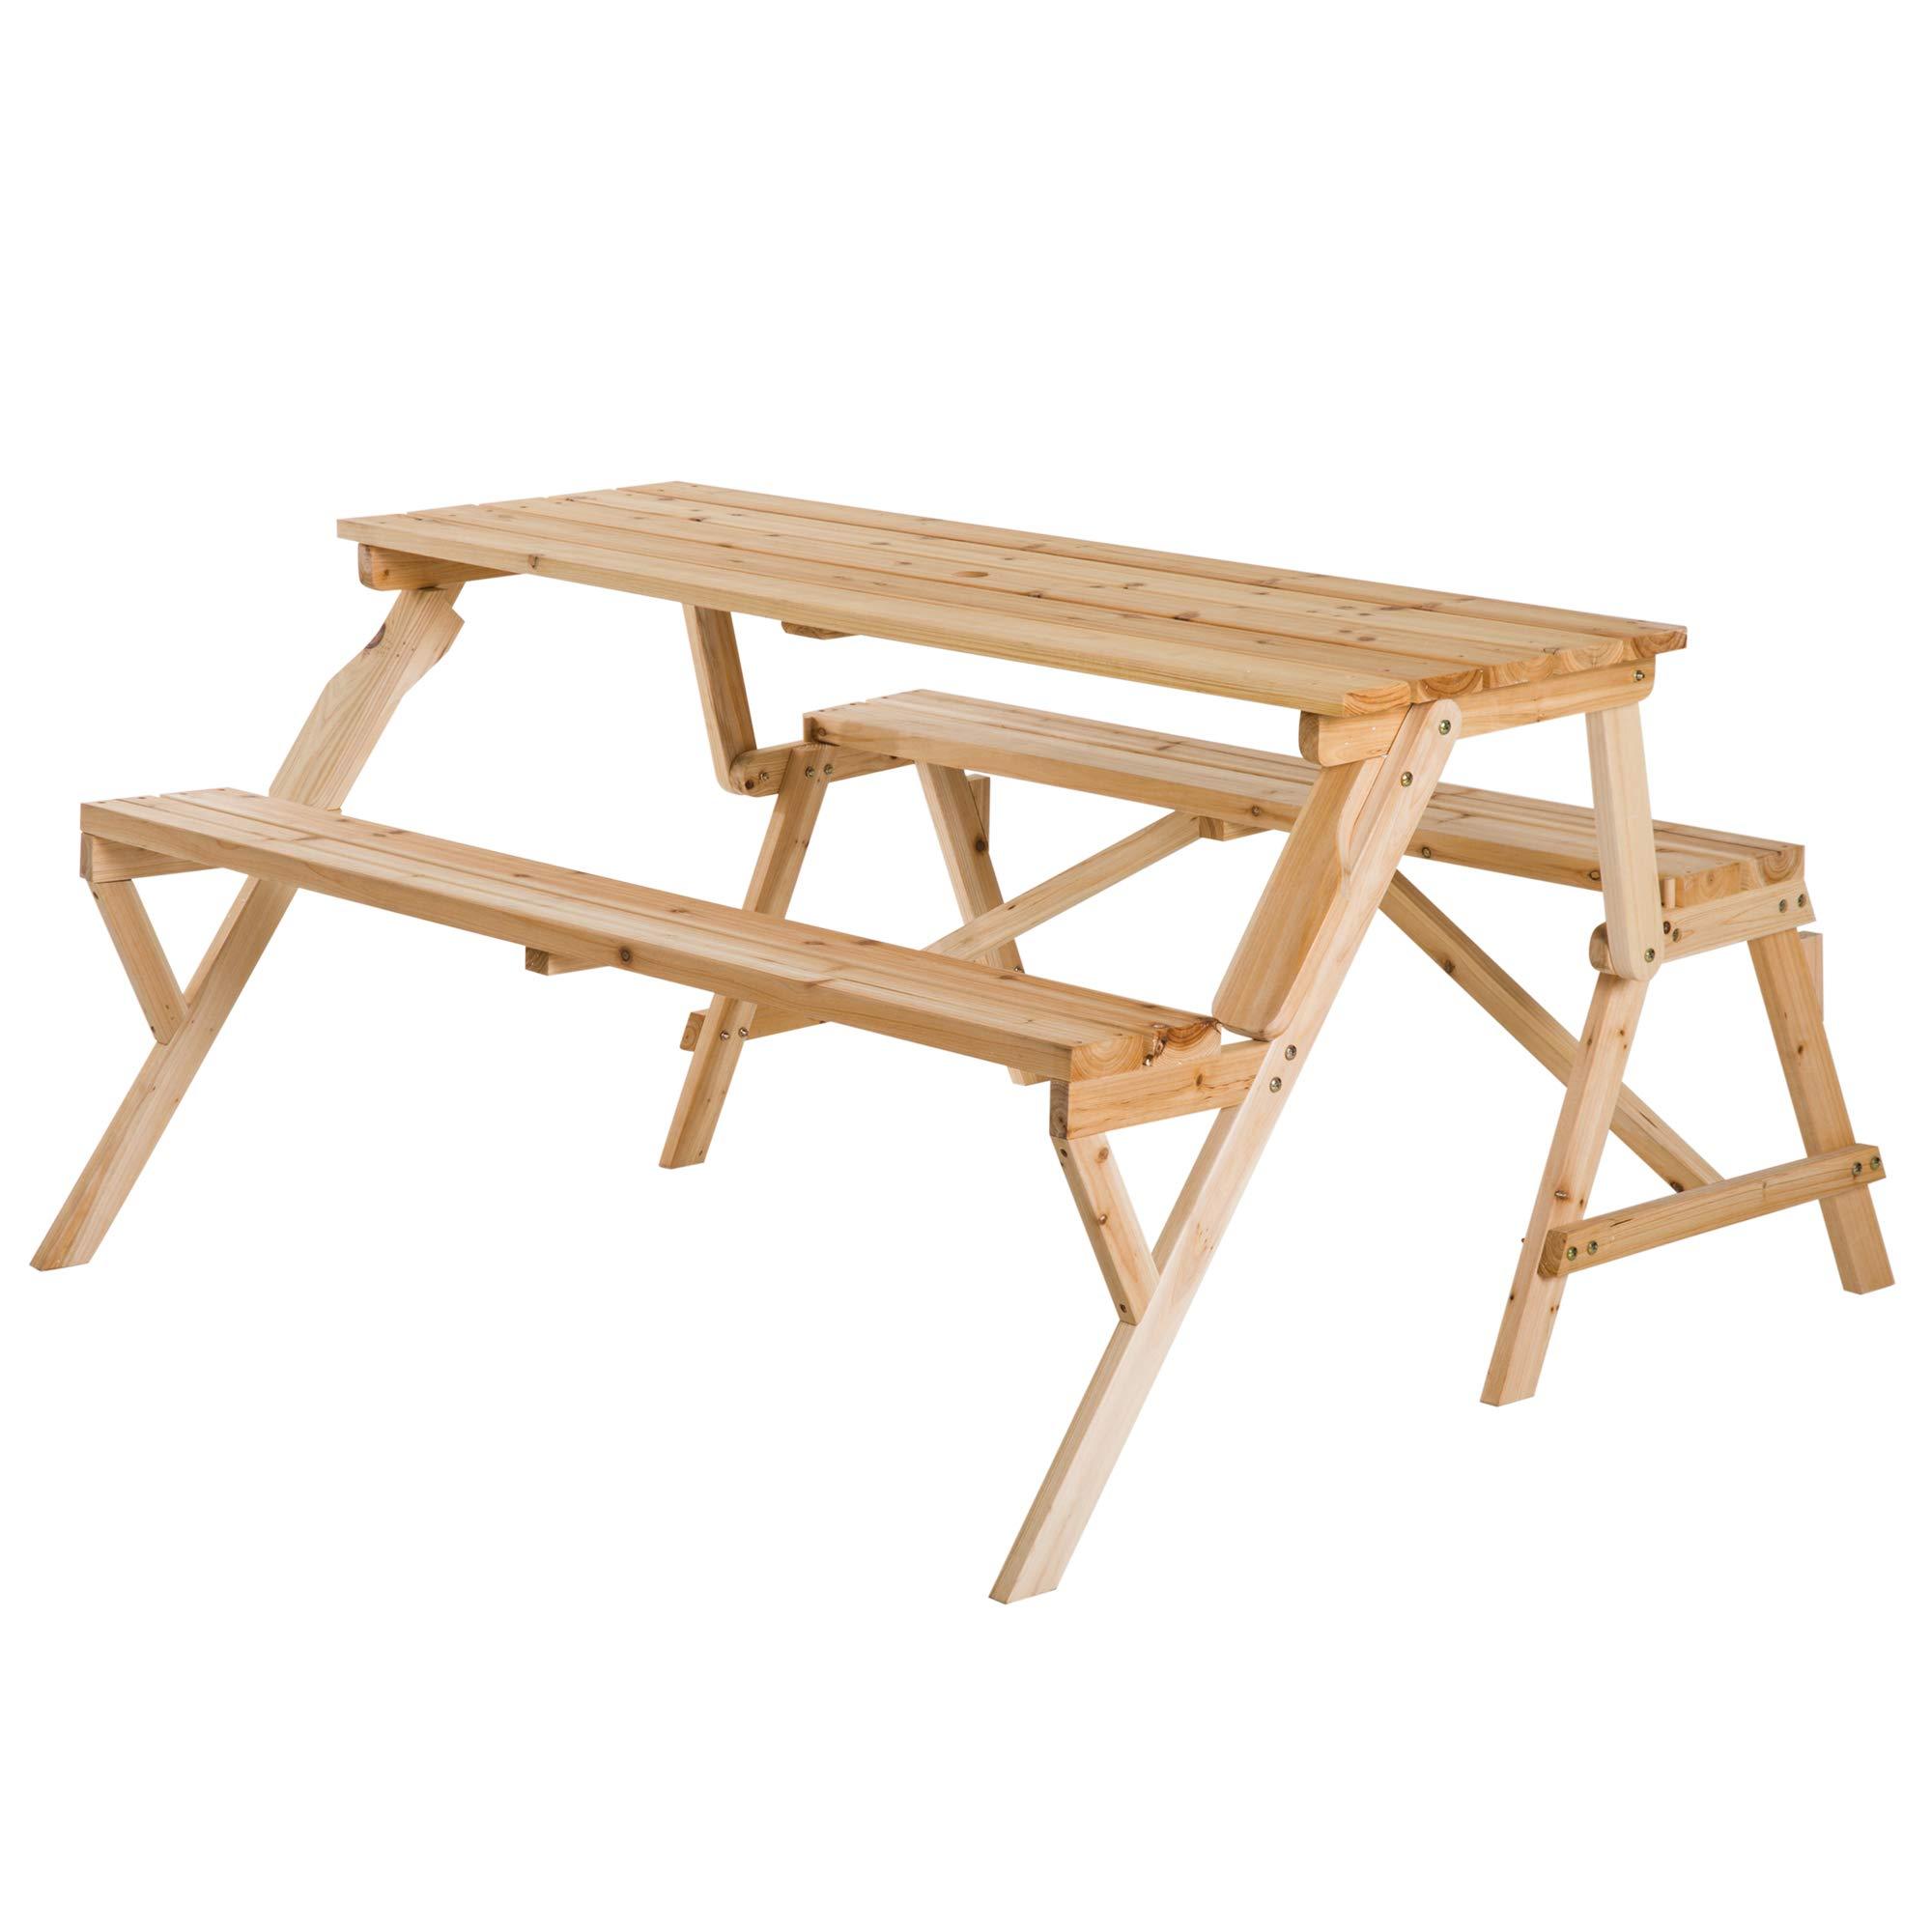 Outsunny Wood 2-in-1 Convertible Picnic Table Garden Bench Folding With Parasol Hole Patio Outdoor Furniture- Buy Online In El Salvador At Elsalvador.desertcart.com. ProductId : 120943063.